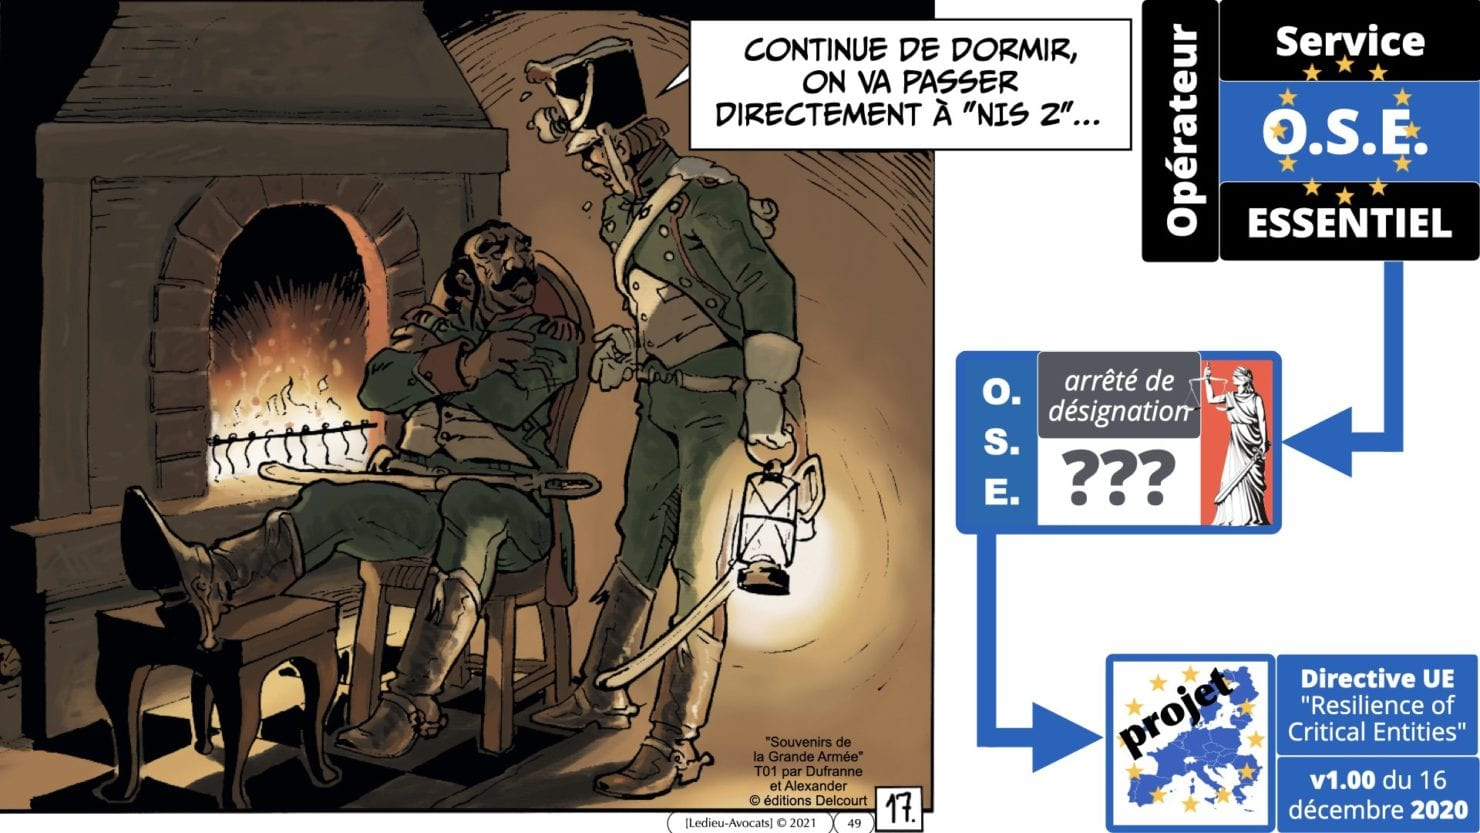 337 cyber sécurité #1 OIV OSE Critical Entities © Ledieu-avocat 15-06-2021.049